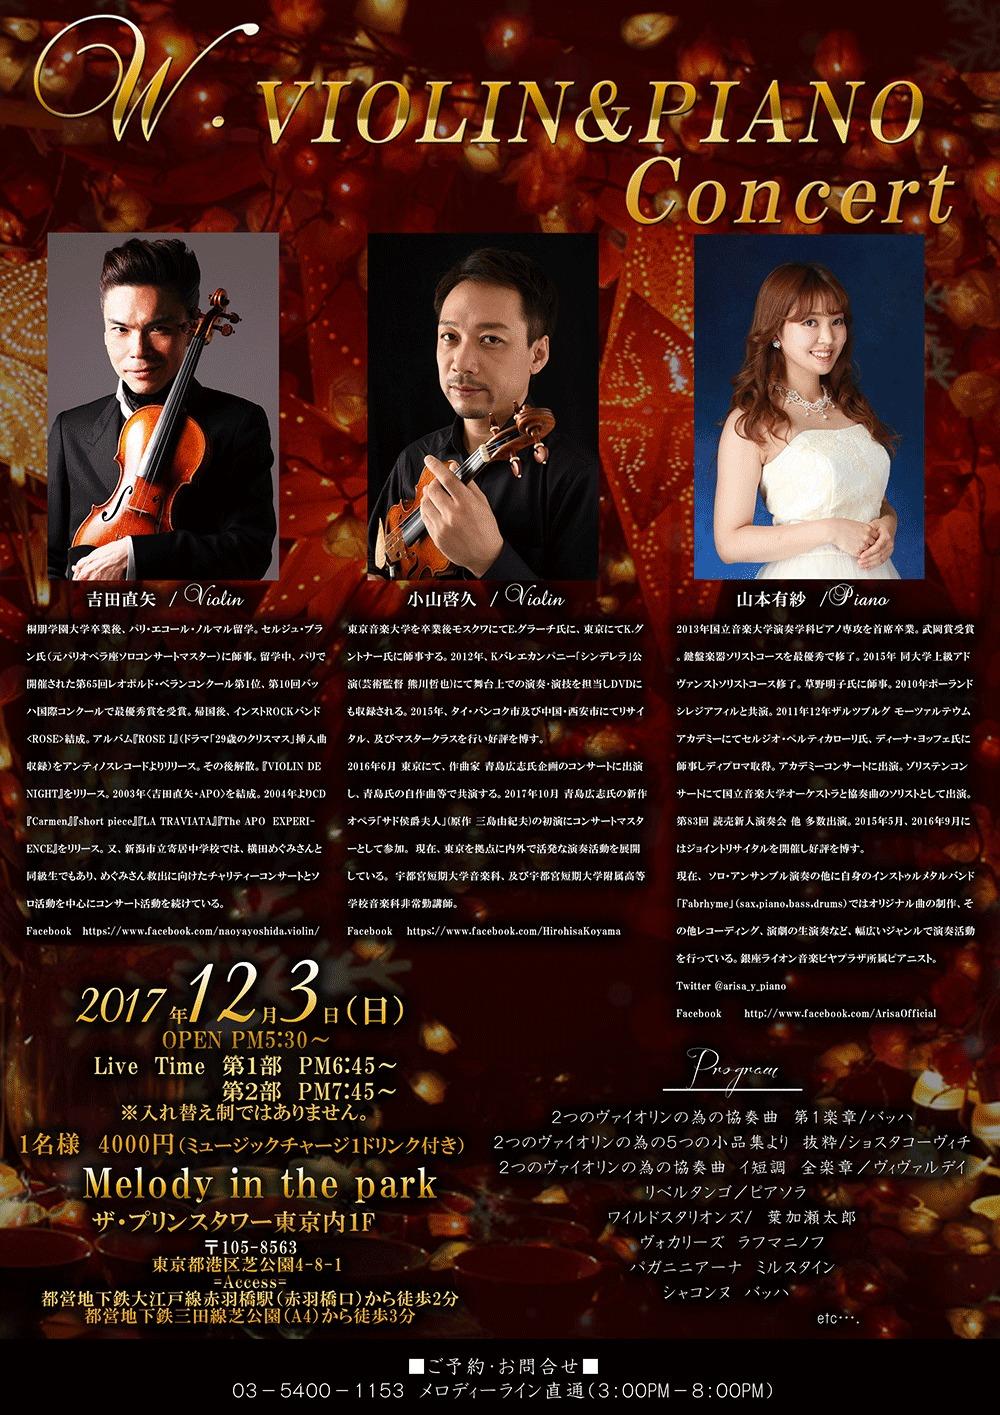 W・VIOLIN & PIANO Concert